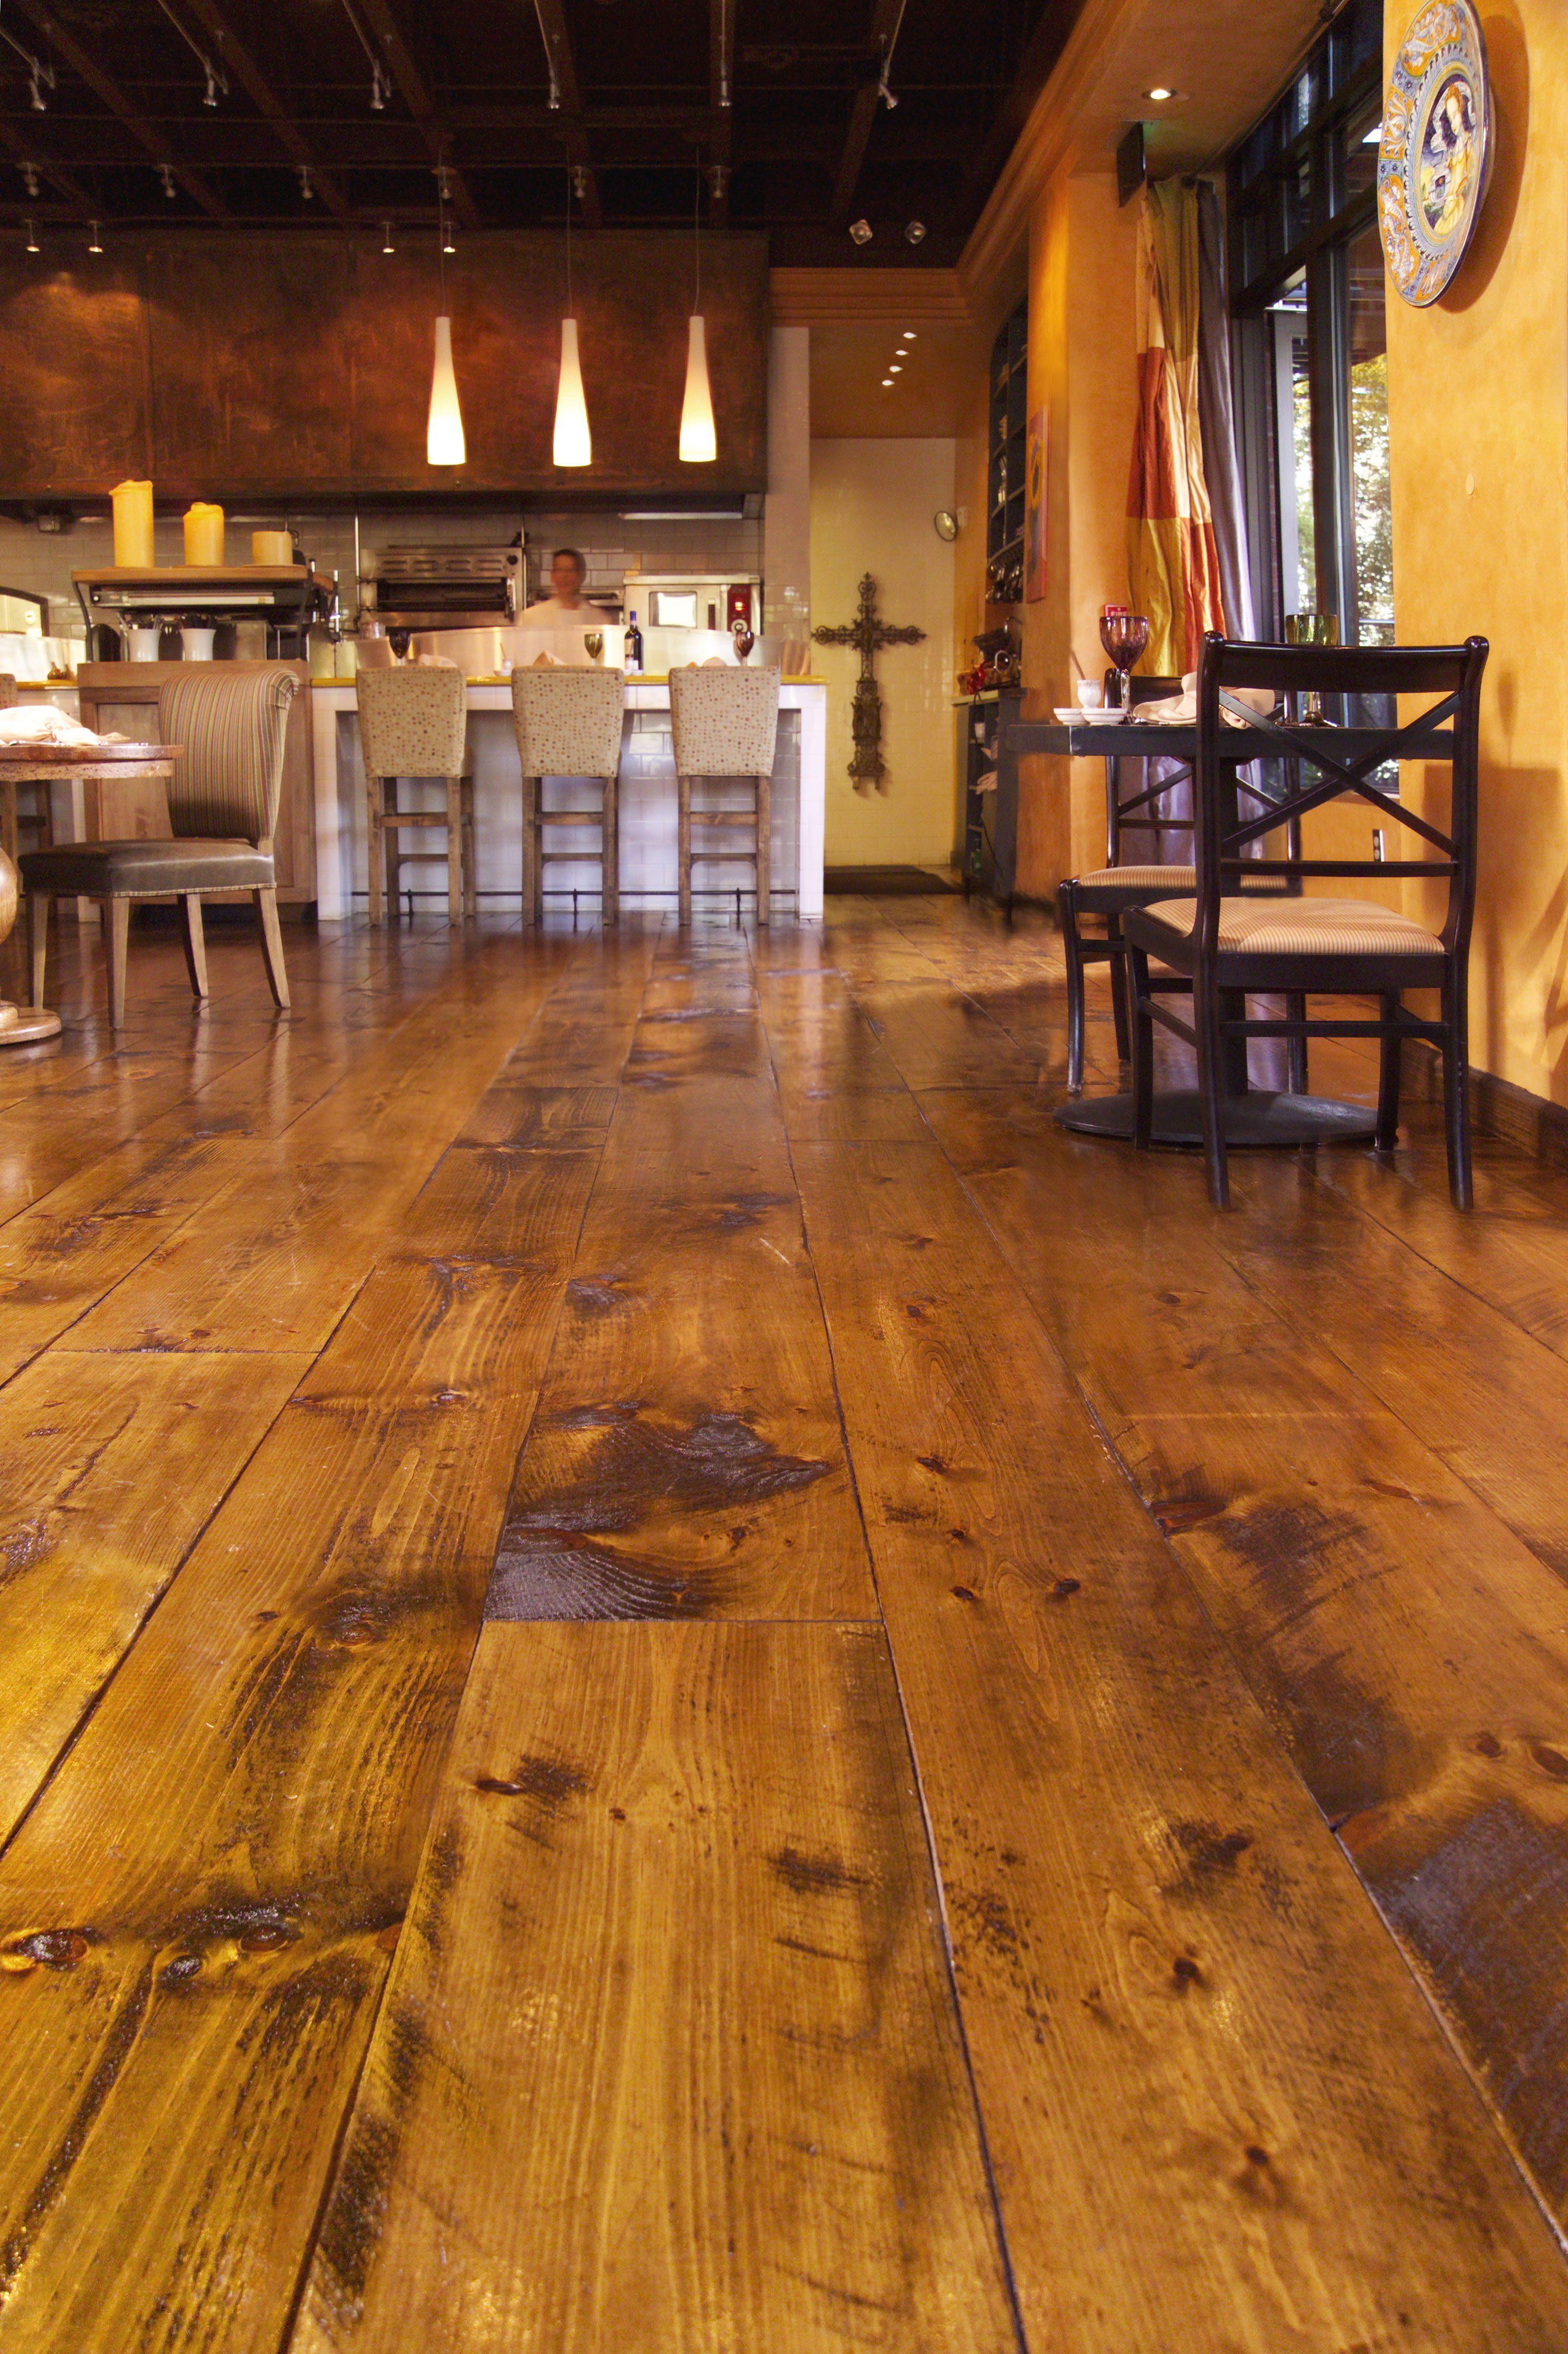 Eastern Hit Or Miss White Pine Floors In A Restaurant